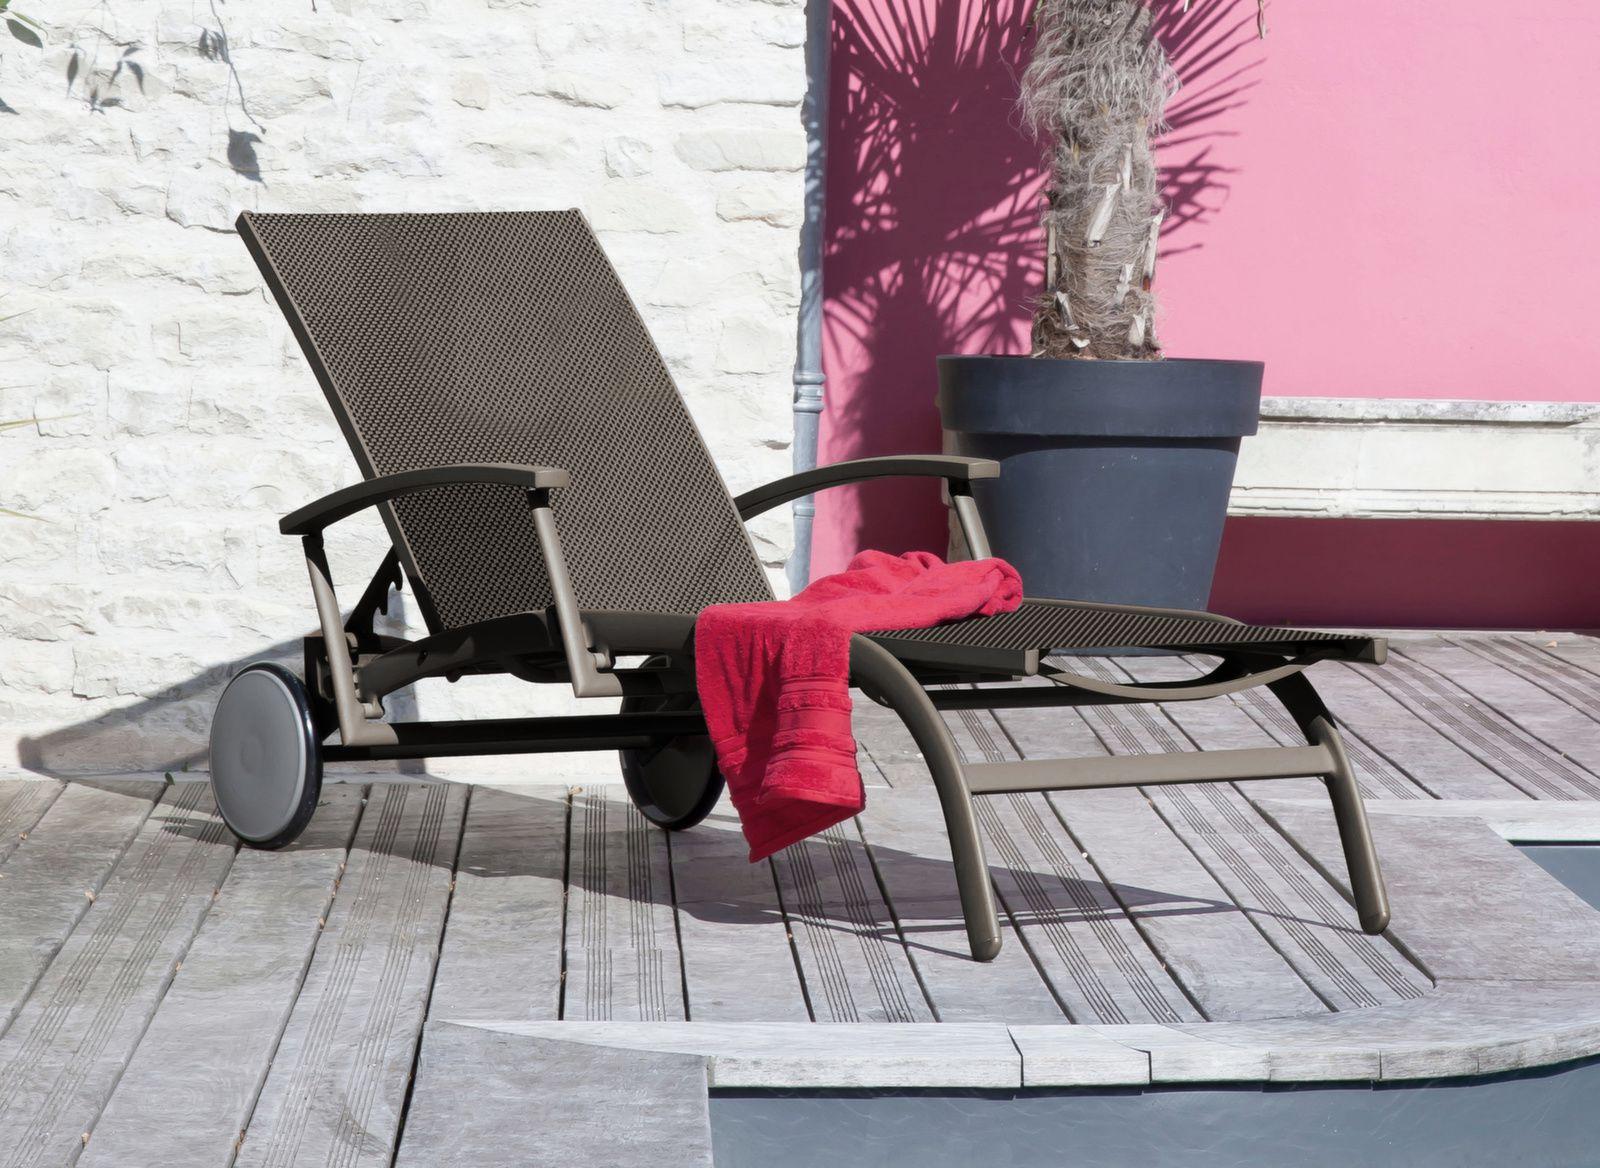 bain de soleil r glable avec accoudoirs l gance oc o proloisirs. Black Bedroom Furniture Sets. Home Design Ideas